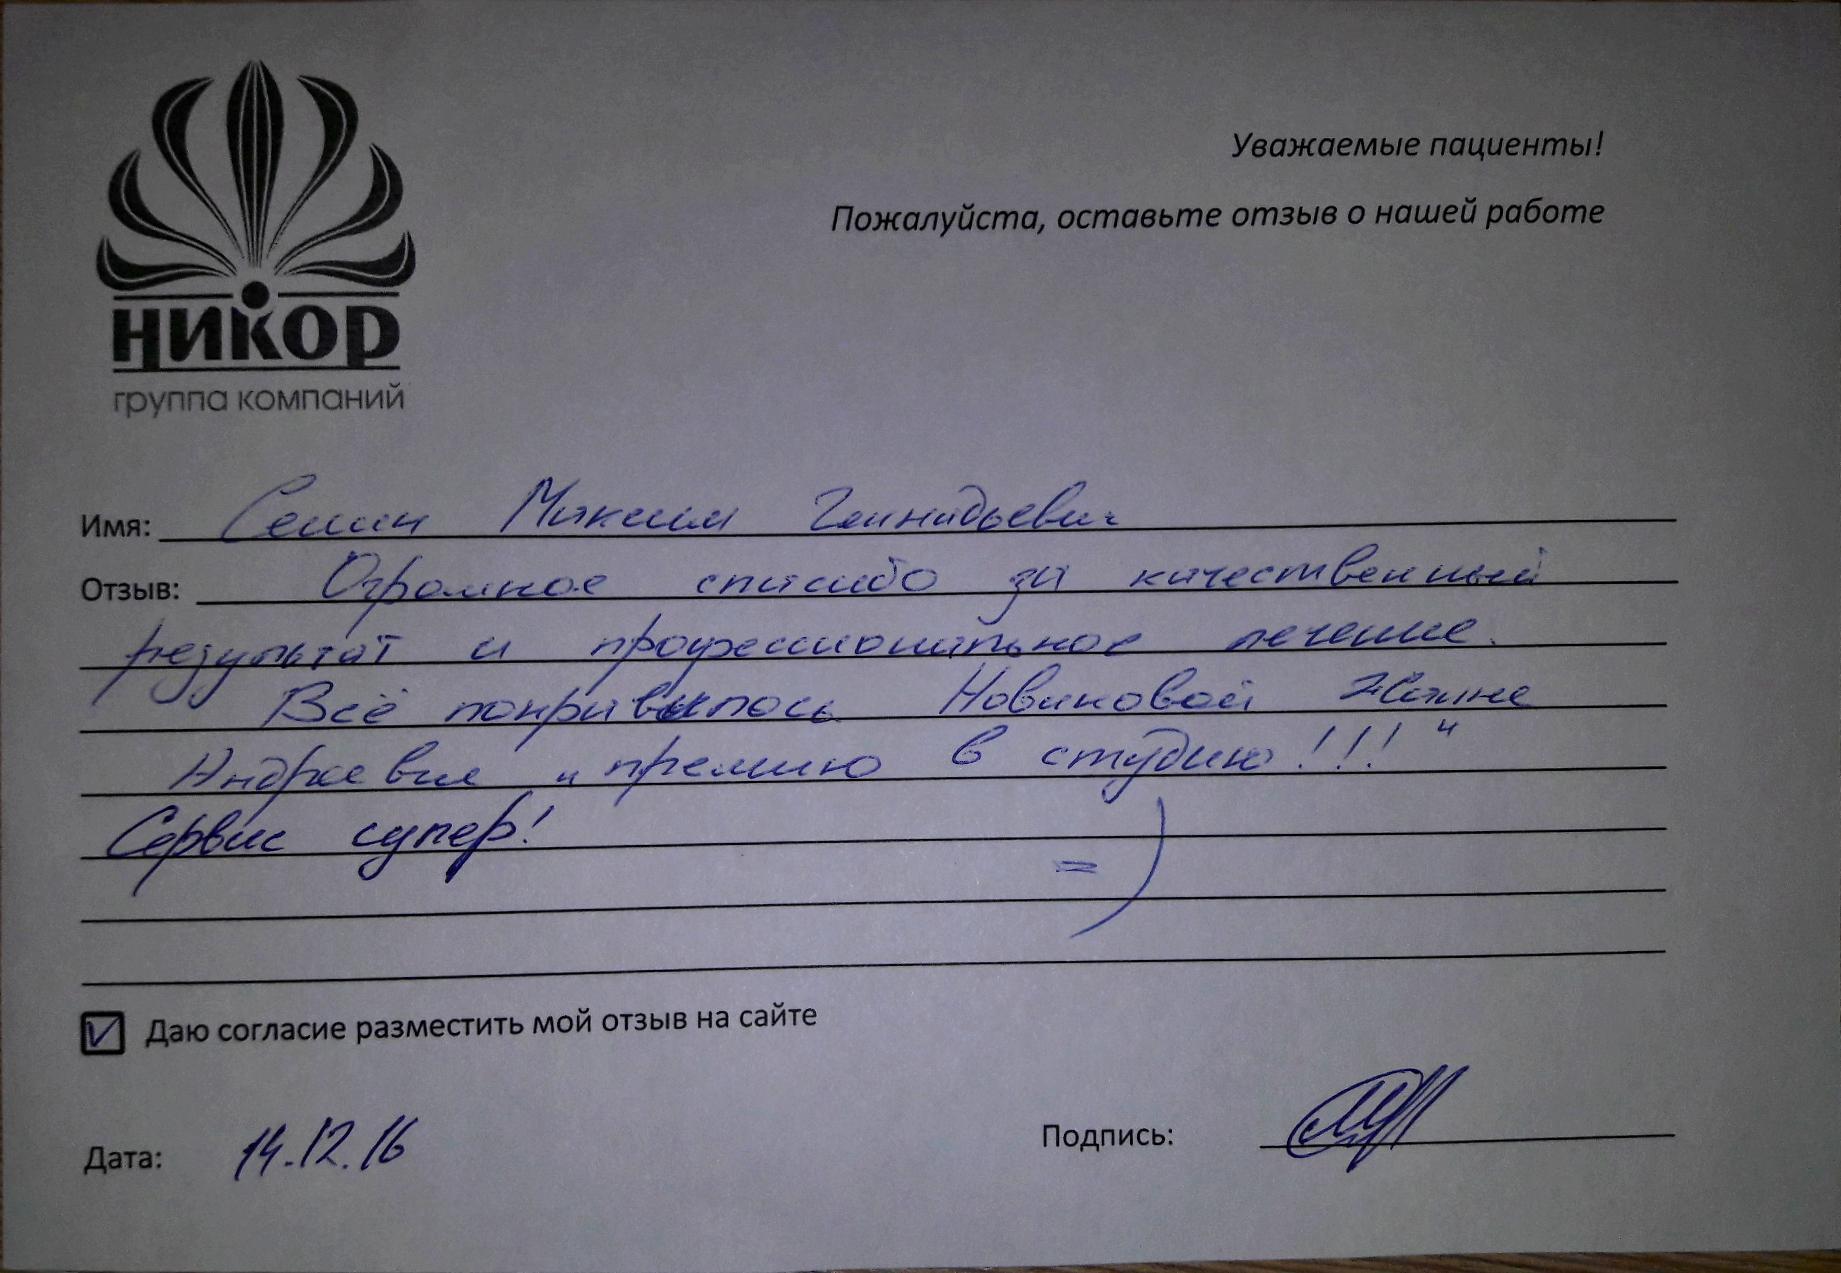 Максим Геннадьевич